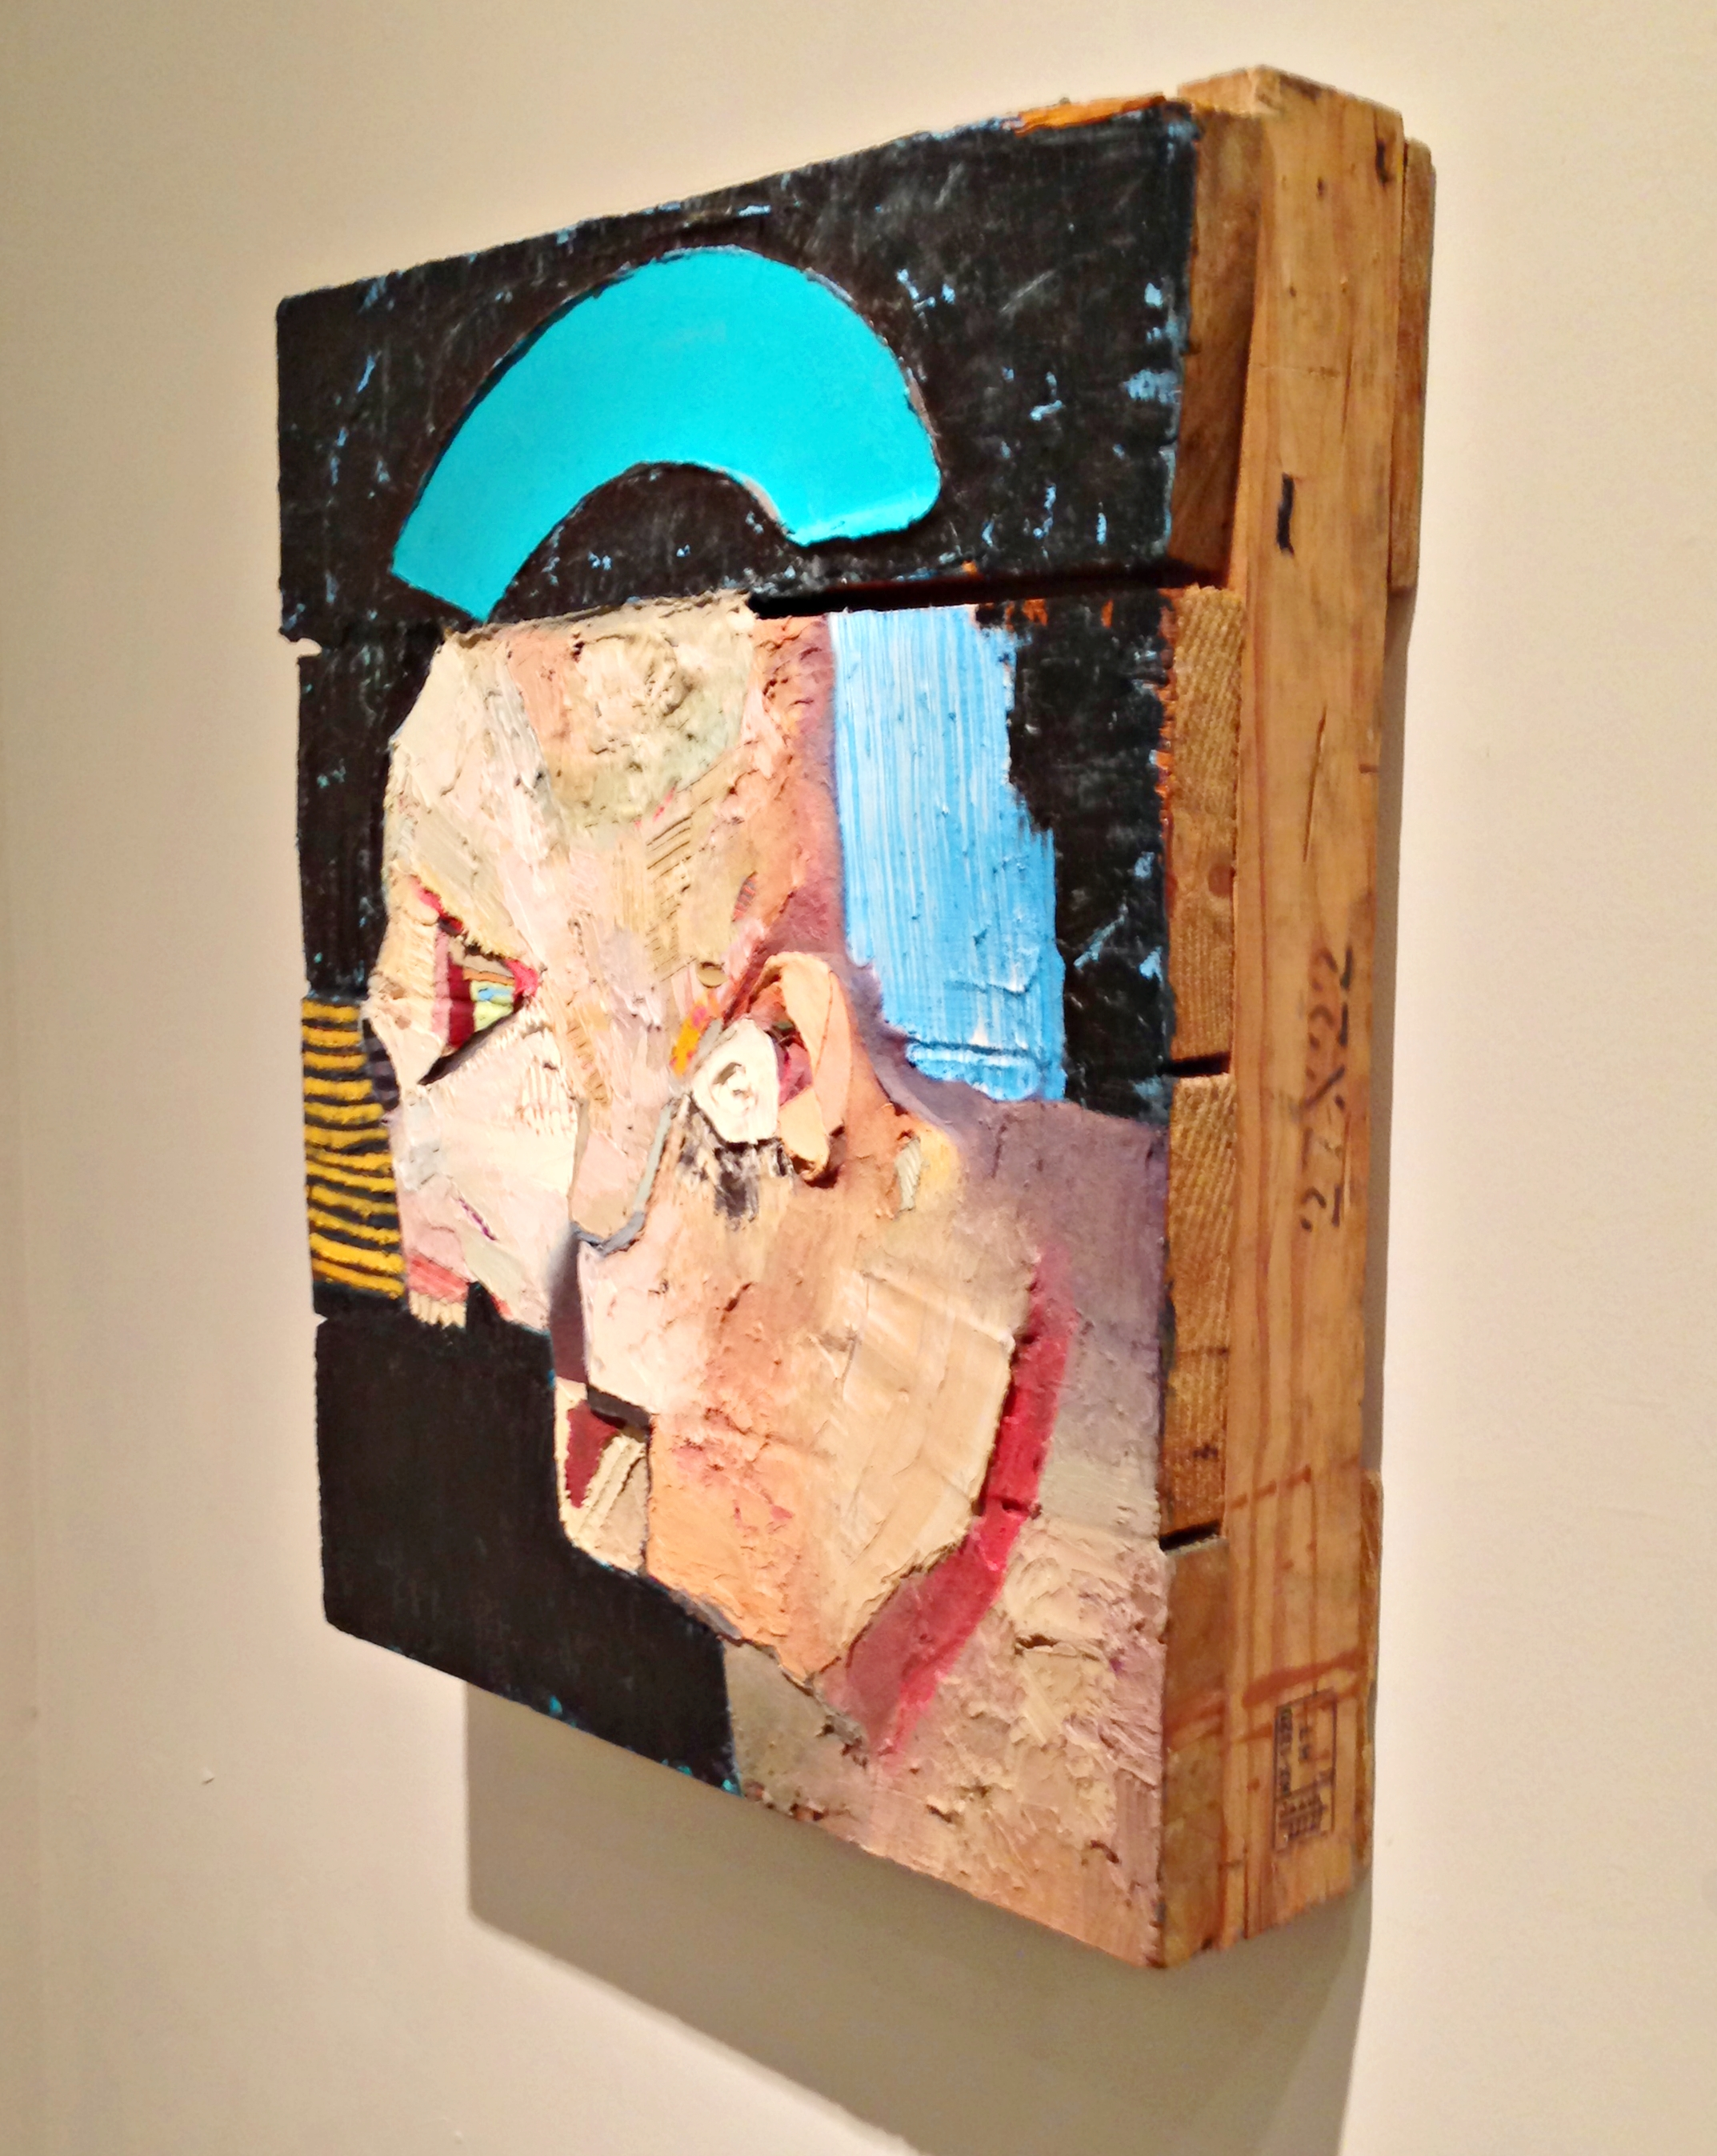 Very creepy, yet very interesting self-portrait on wood by Nicolas Holiber at Allegra LaViola